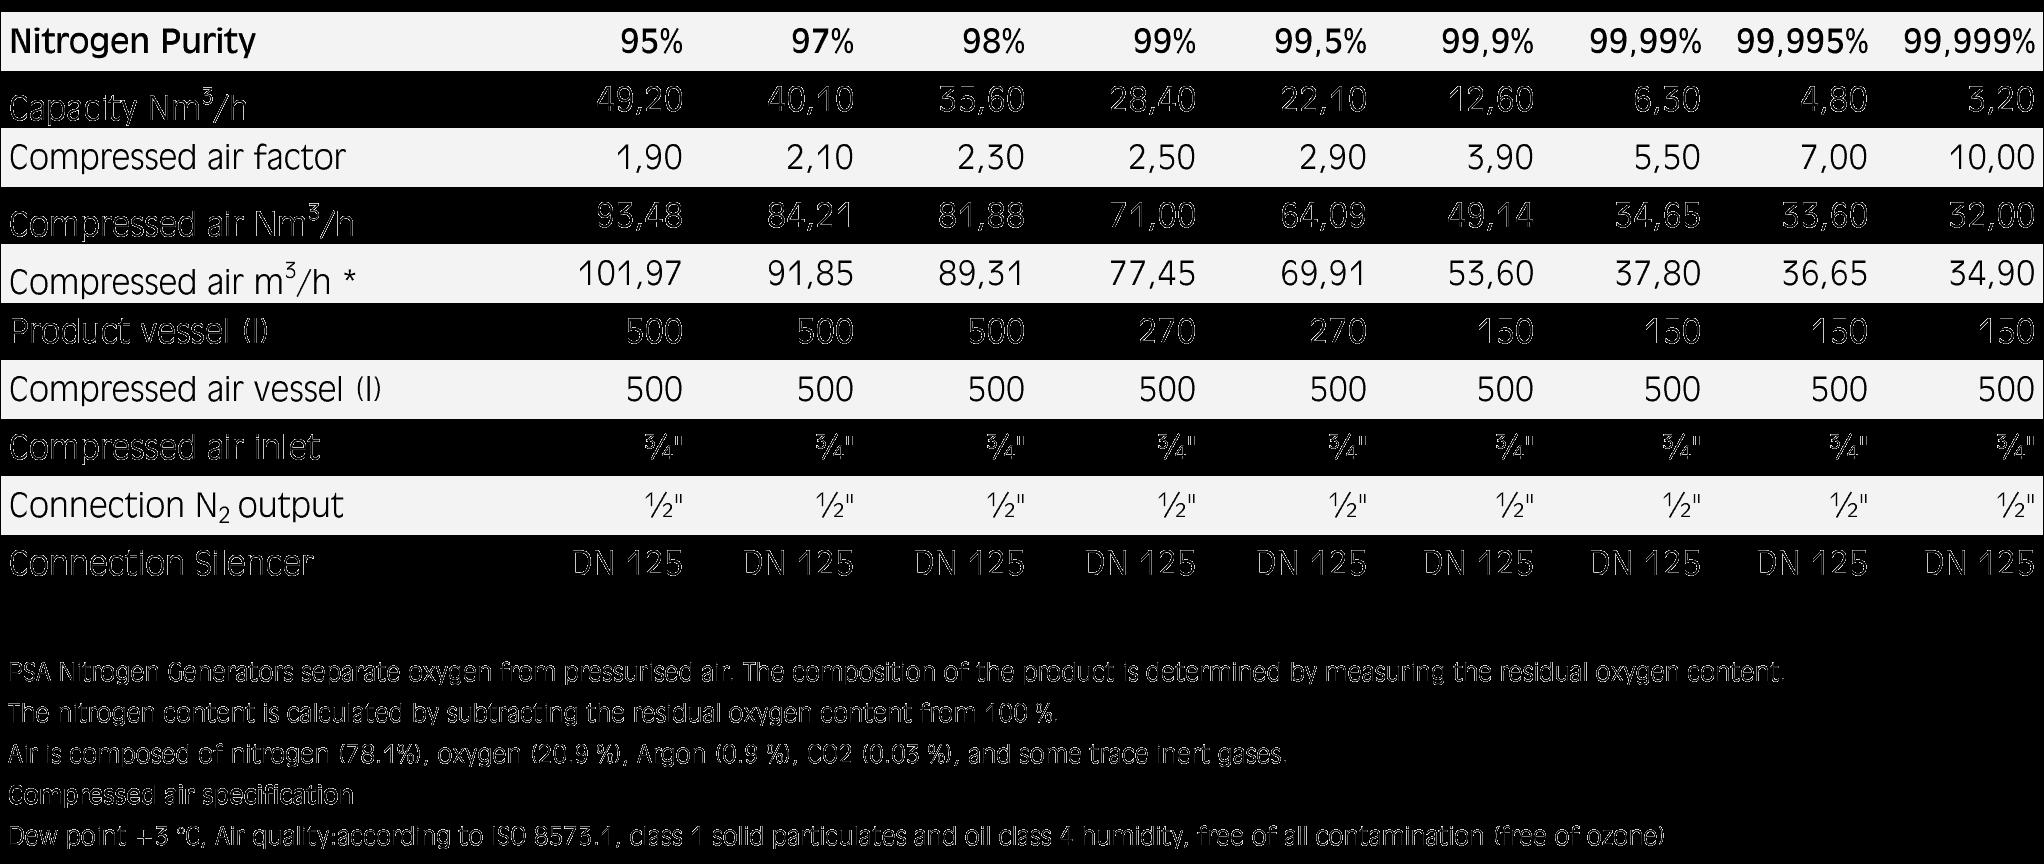 NIG PNOG 1550 parameters tab - NIG-PNOG-1550 PN OnGo Nitrogen Generator 3.2 - 49.2 m3 N2 per hour - nig